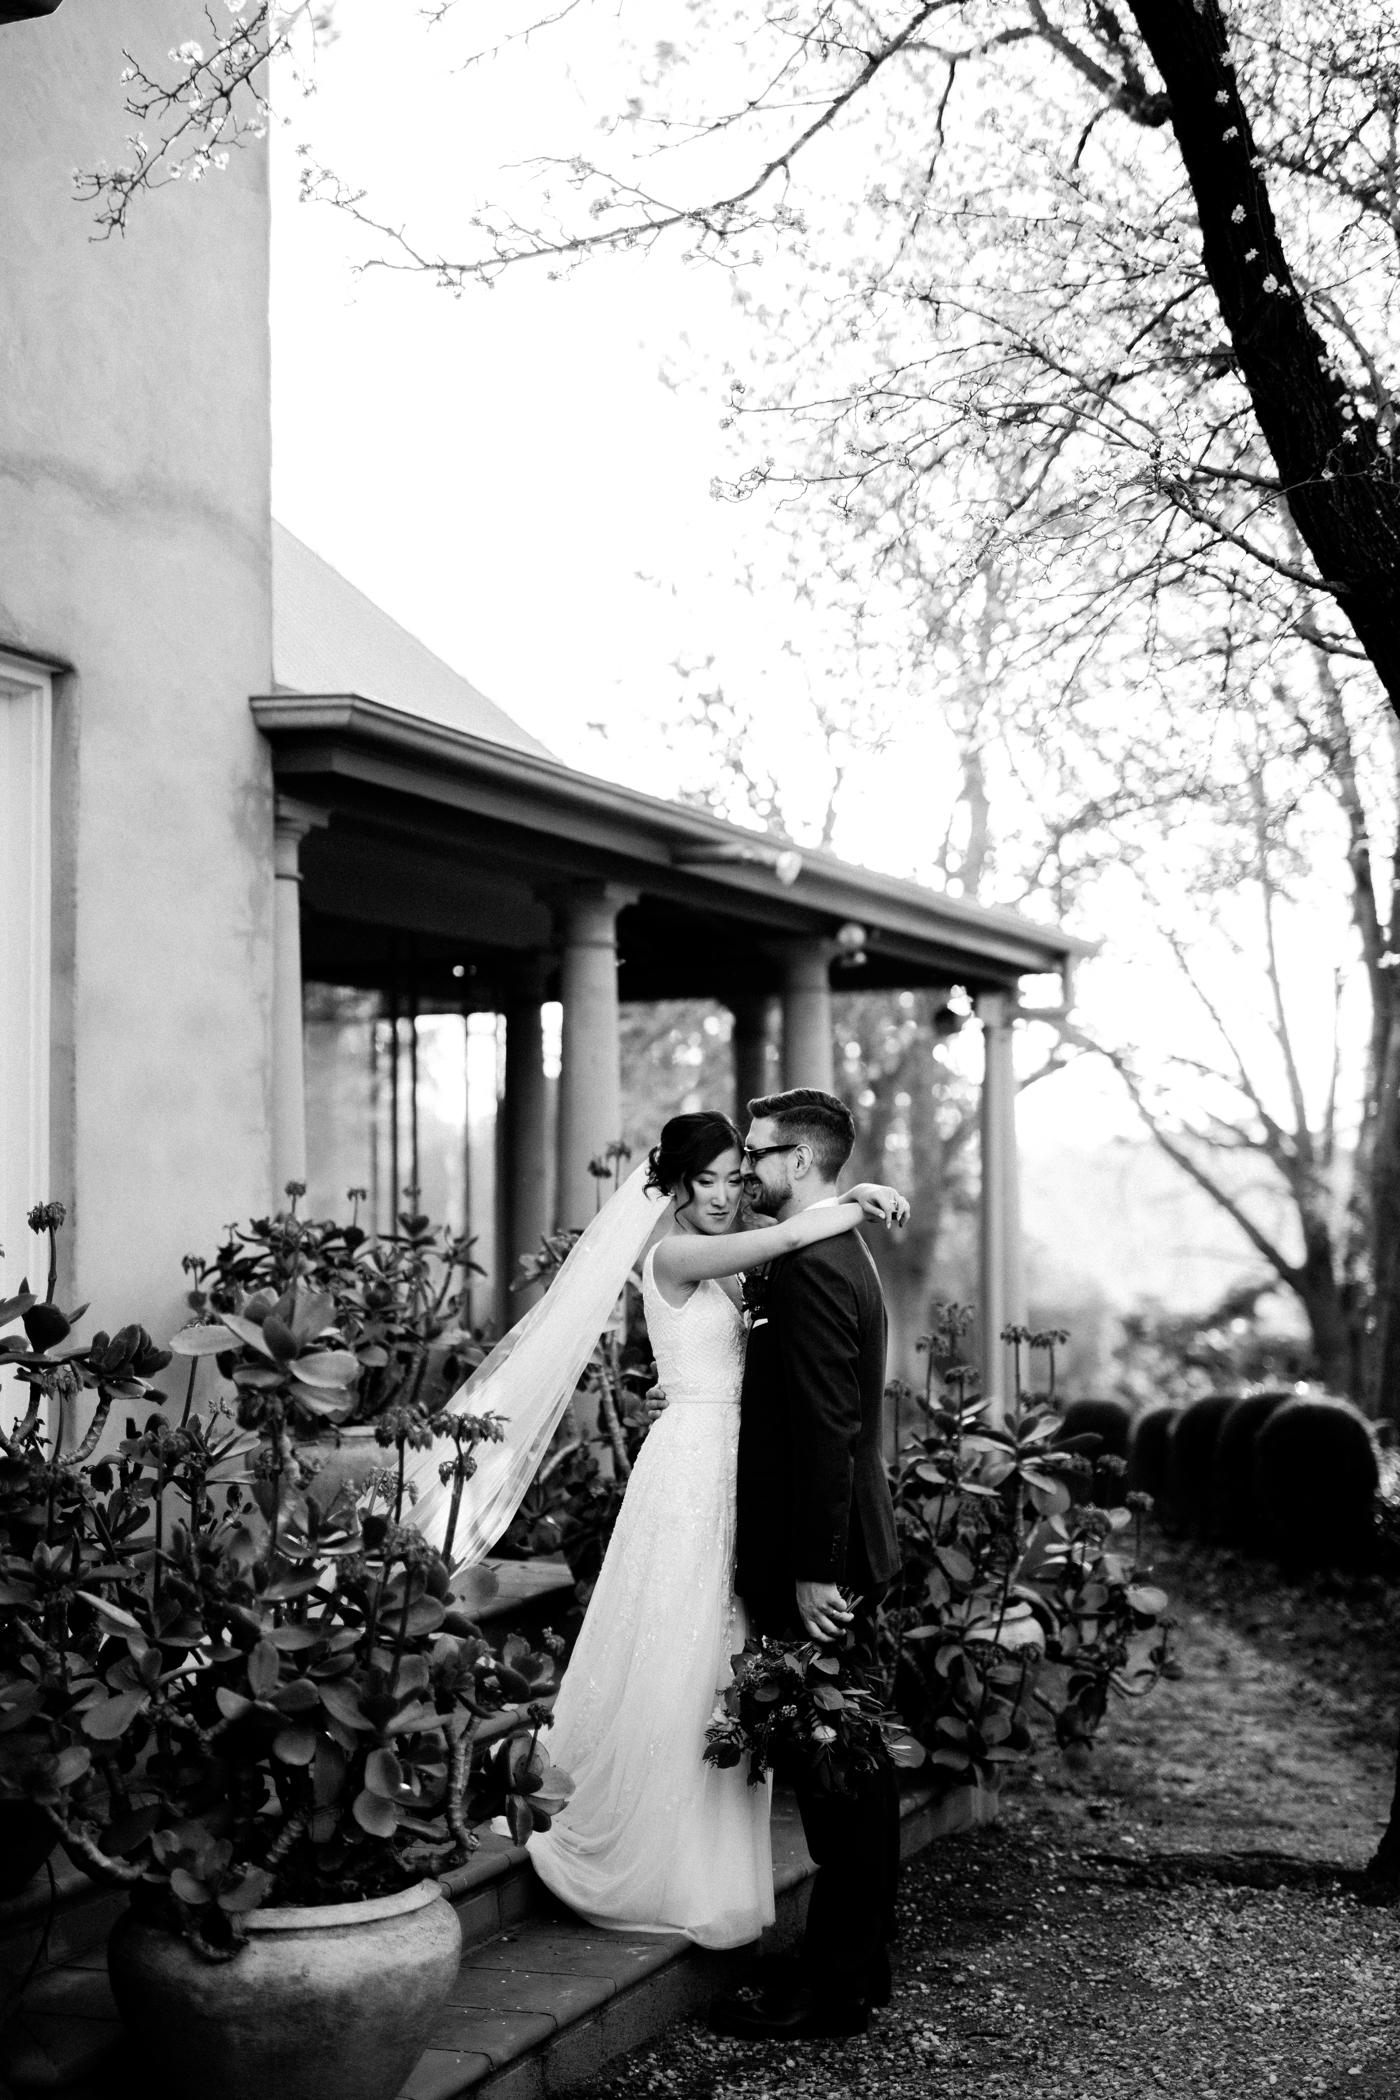 Adelaide Wedding Photographer - Al Ru Farm Wedding in Adelaide - Natural Wedding Photography Australia - www.katherineschultzphotography.com - Todd & Rachel_0048.jpg